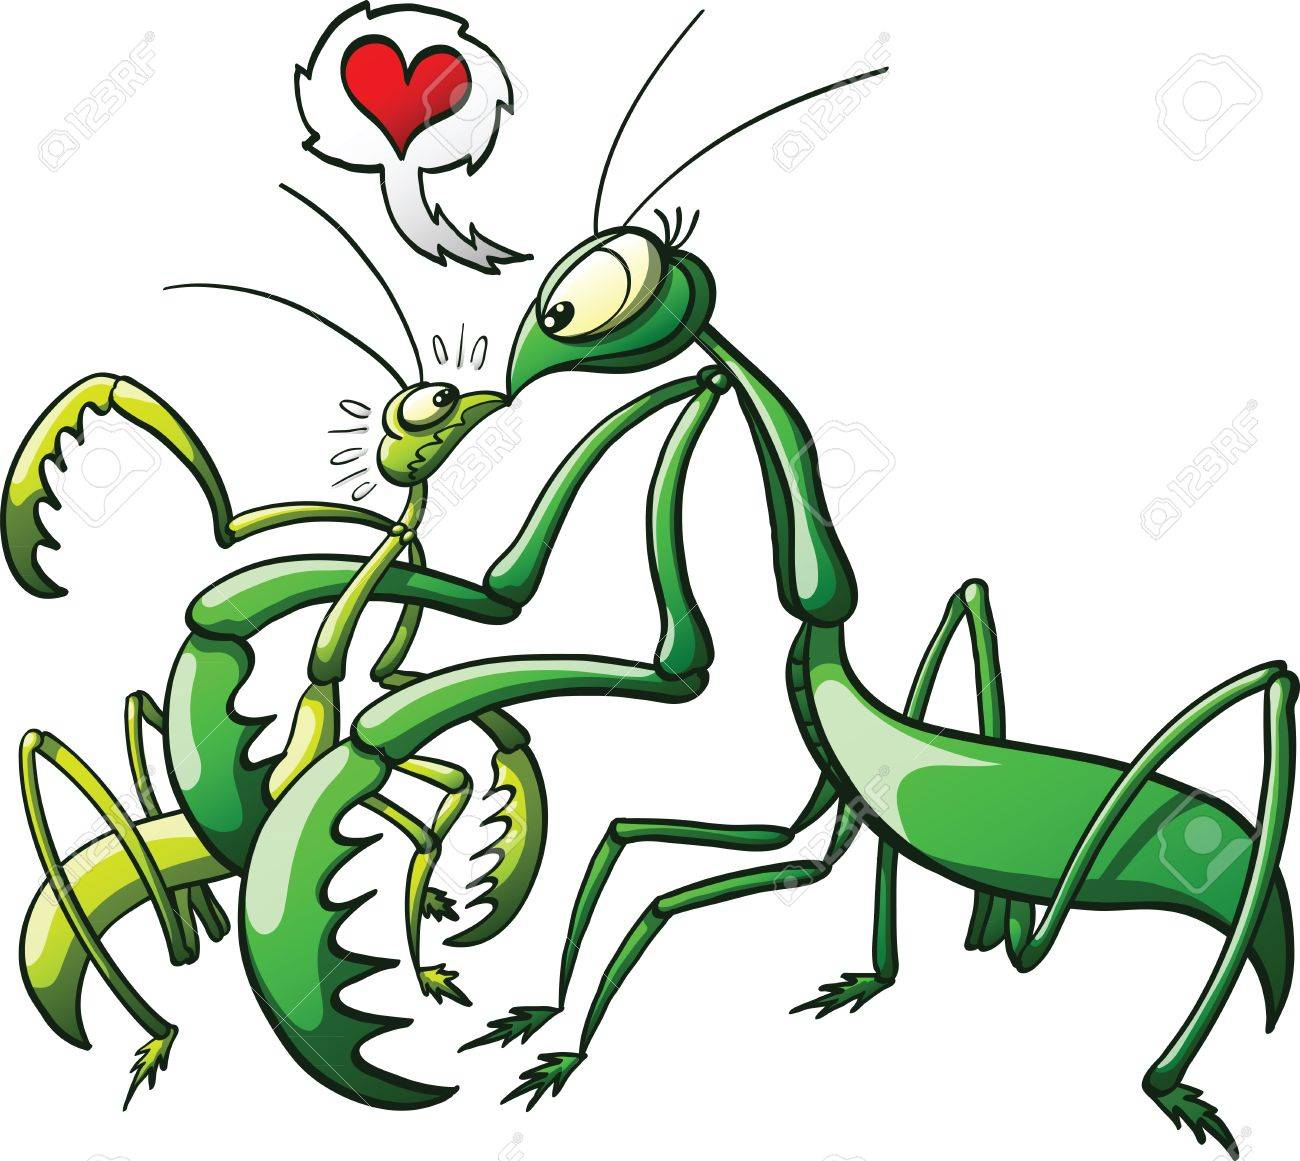 Female praying mantis intimidating mate while inviting him to make love Stock Vector - 17059286